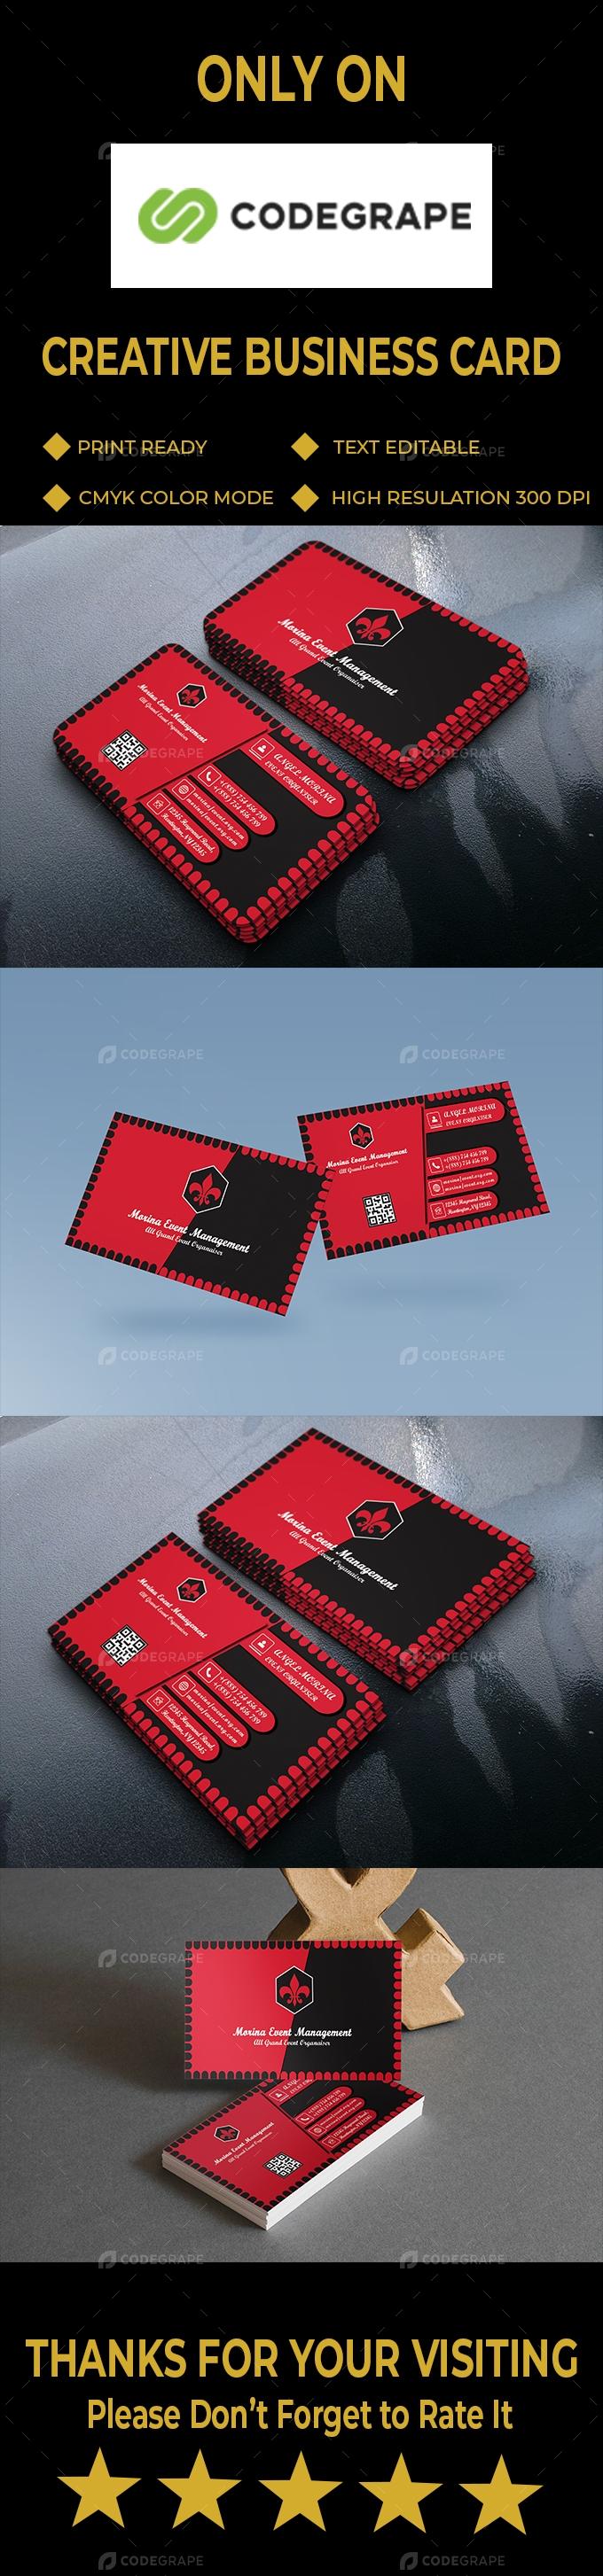 Event Management Business Card